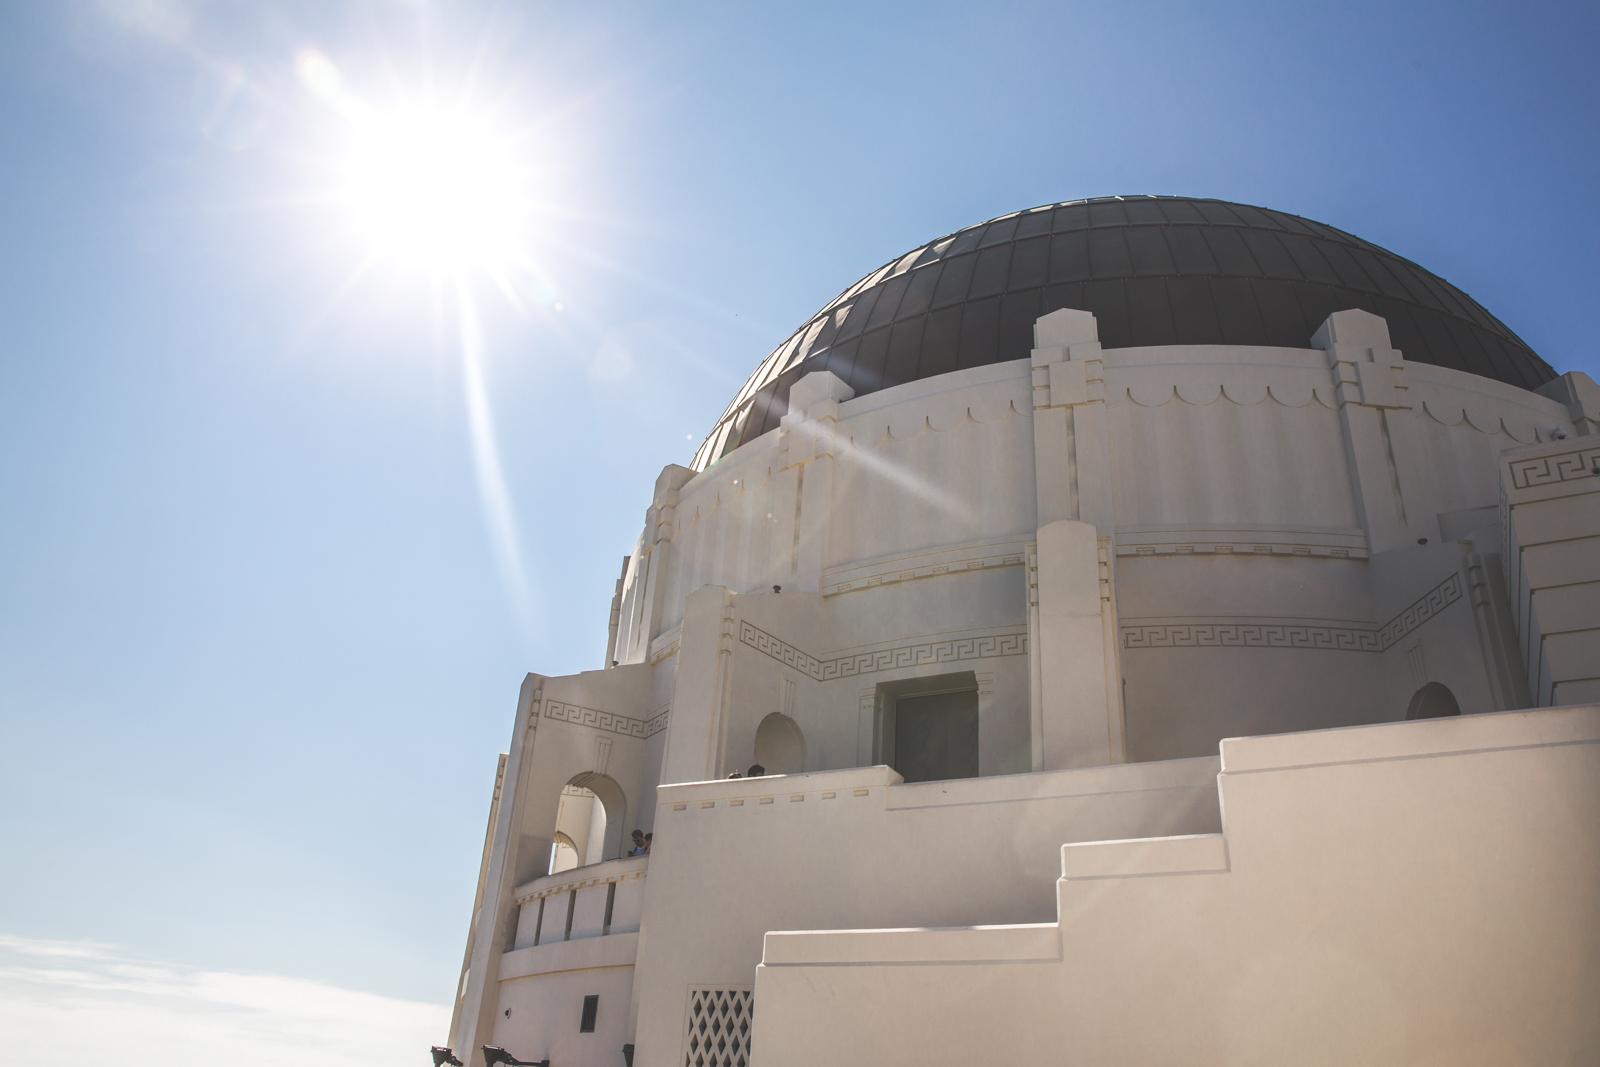 observatorykids-5487